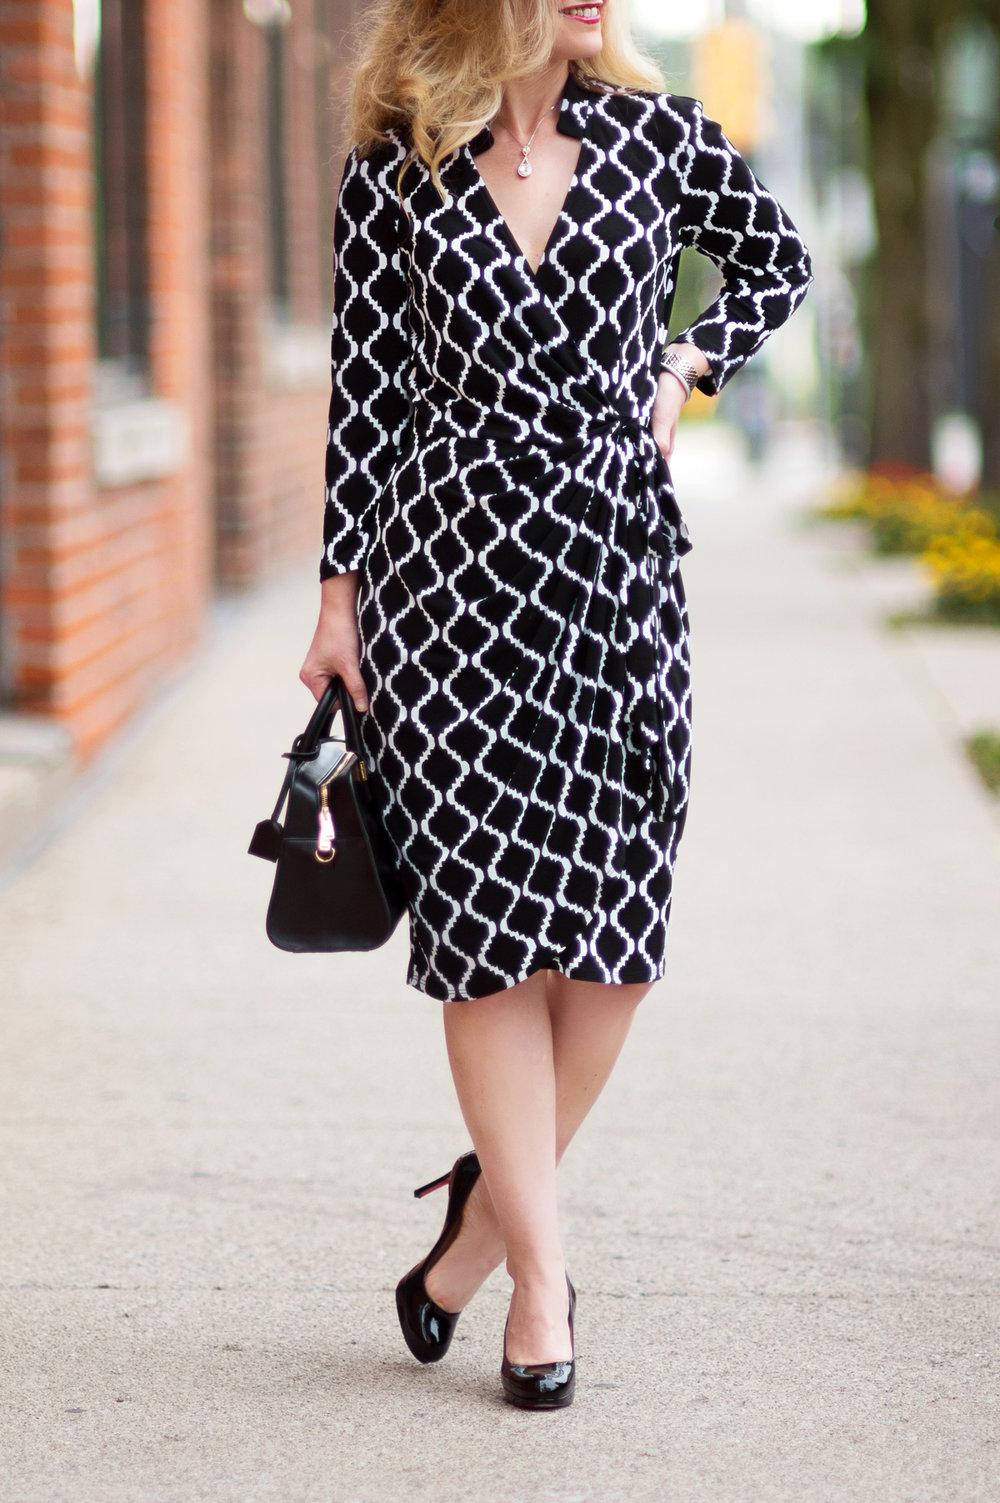 Petite-Fashion-and-Style-Blog---Maggy-London-Philomena-Dress-2.jpg